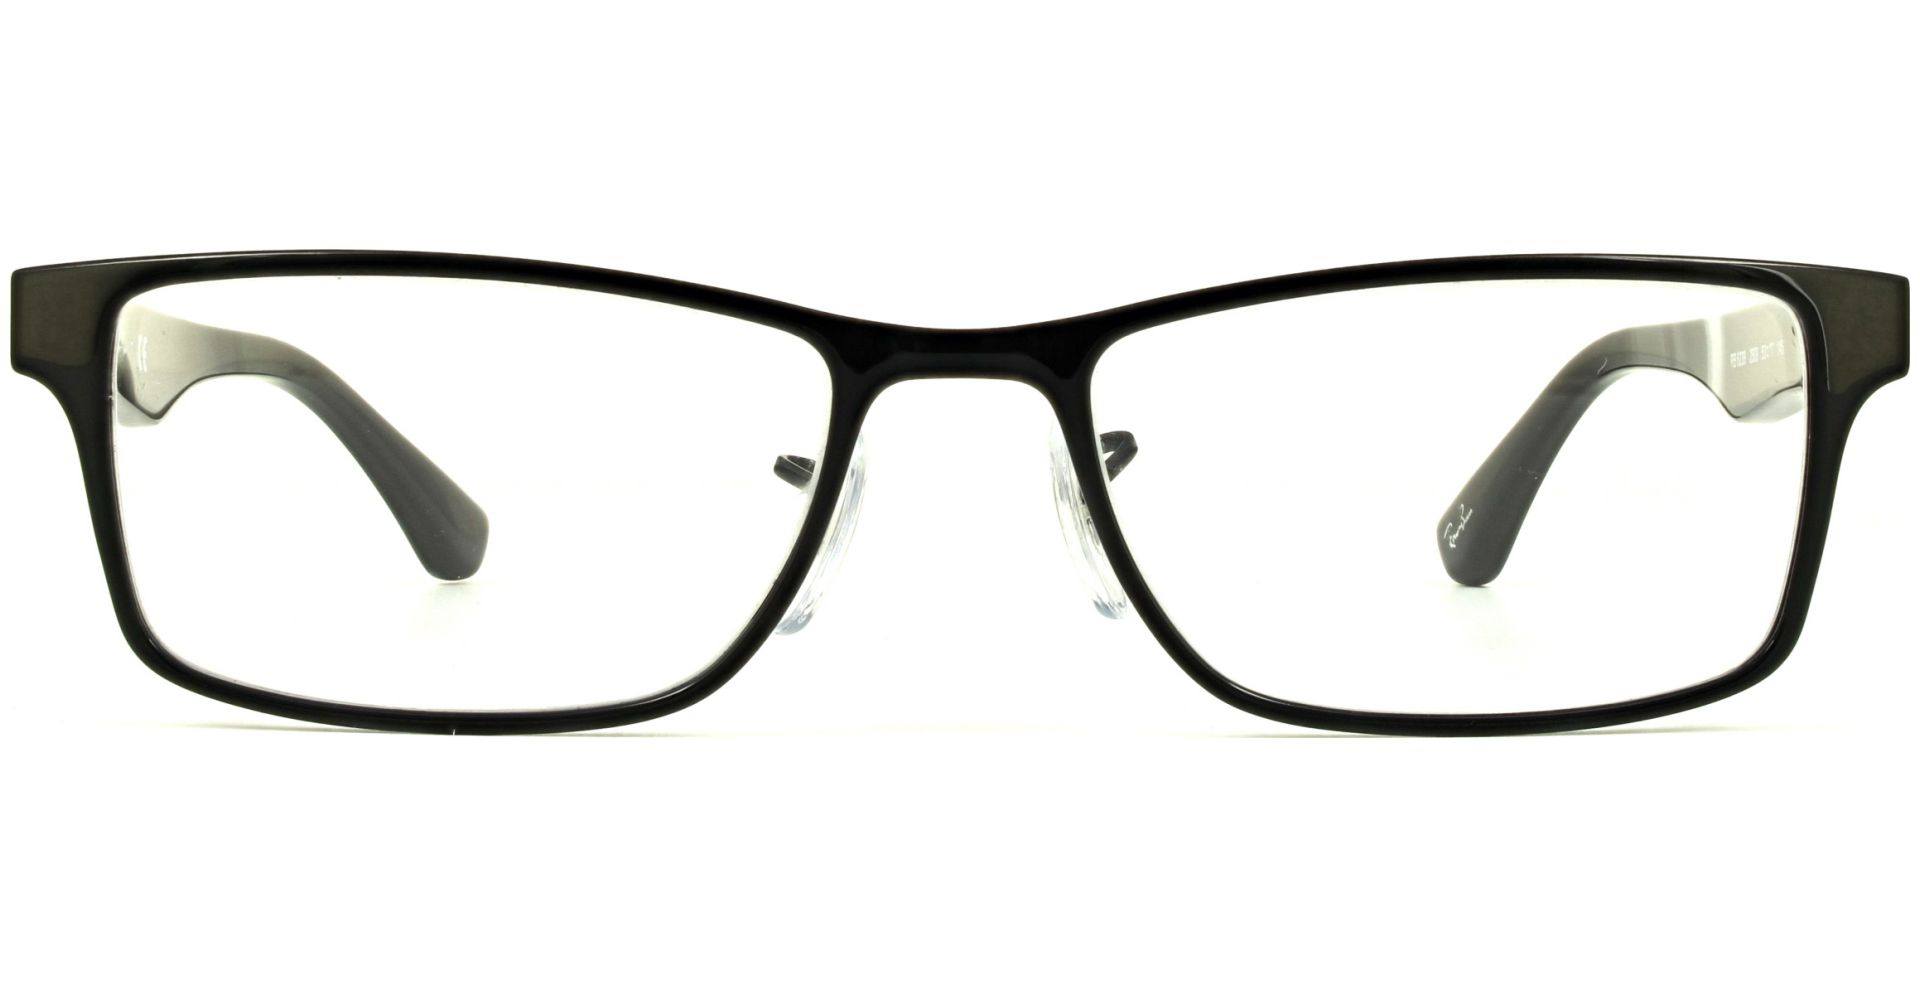 f706a93bf4 Ray-Ban - RX6238 2509 5317 Shiny Black - von Lensbest